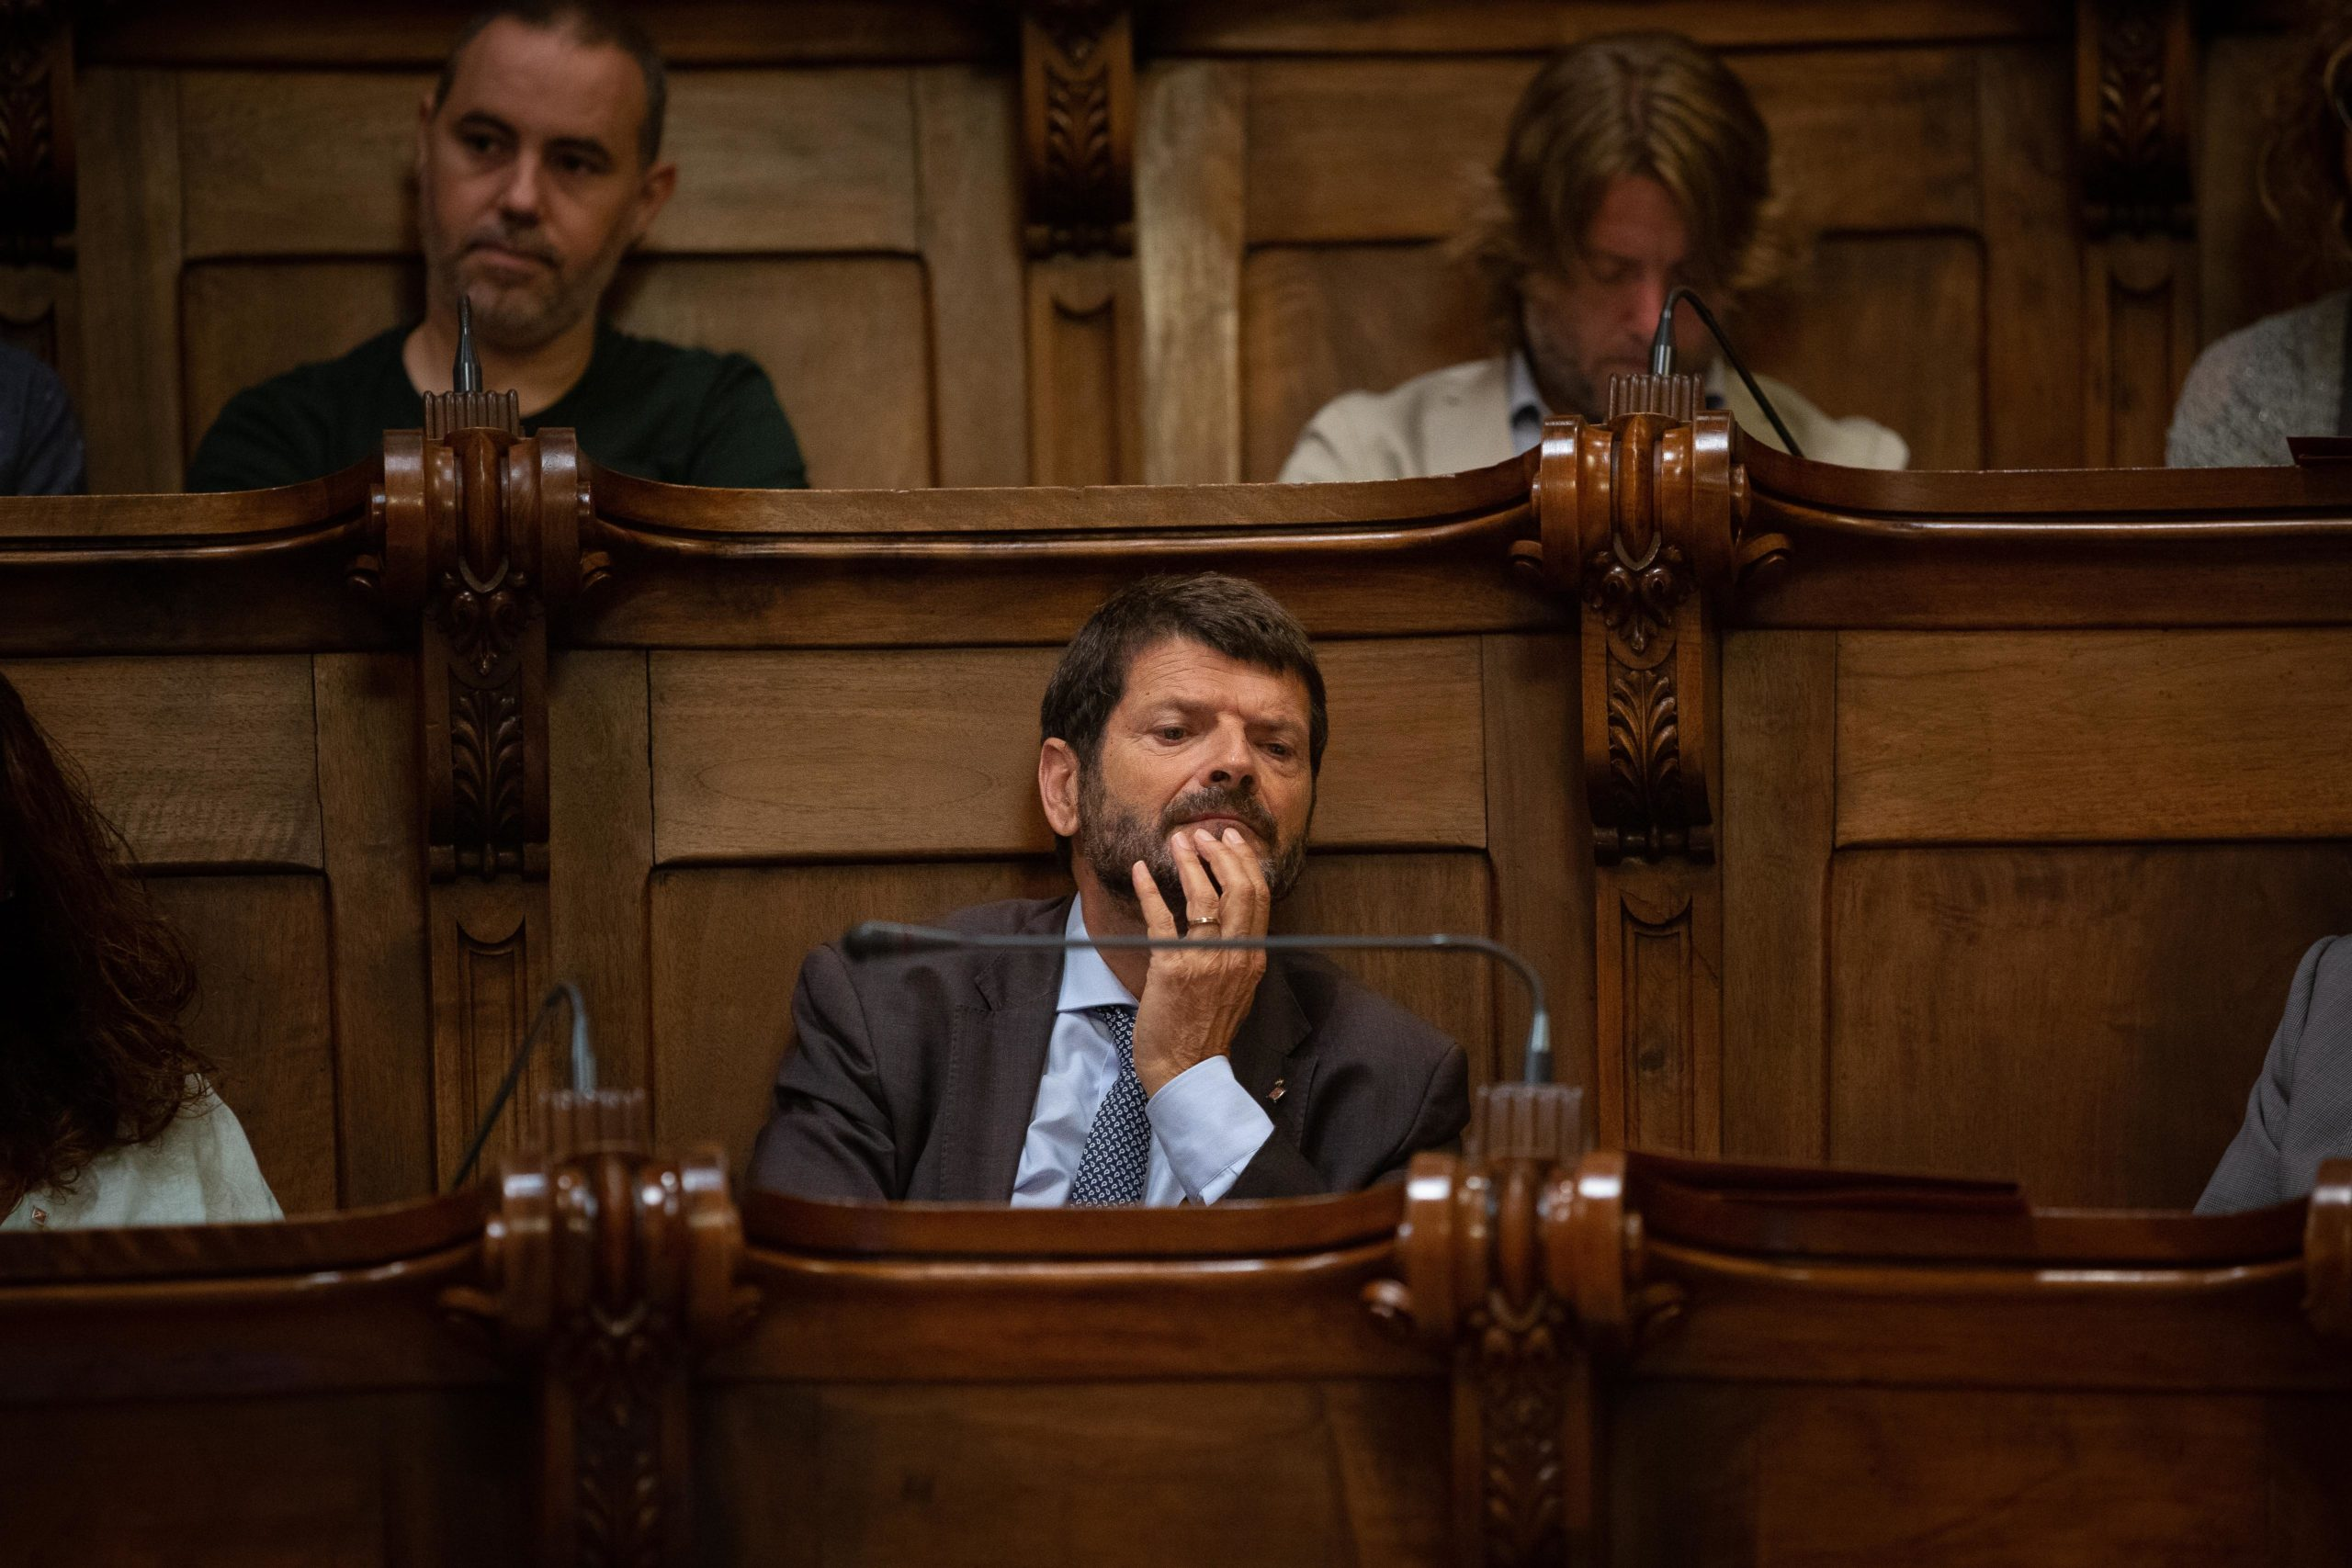 Albert Batlle en una imatge d'arxiu al ple barceloní. / Europa Press (David Zorrakino)